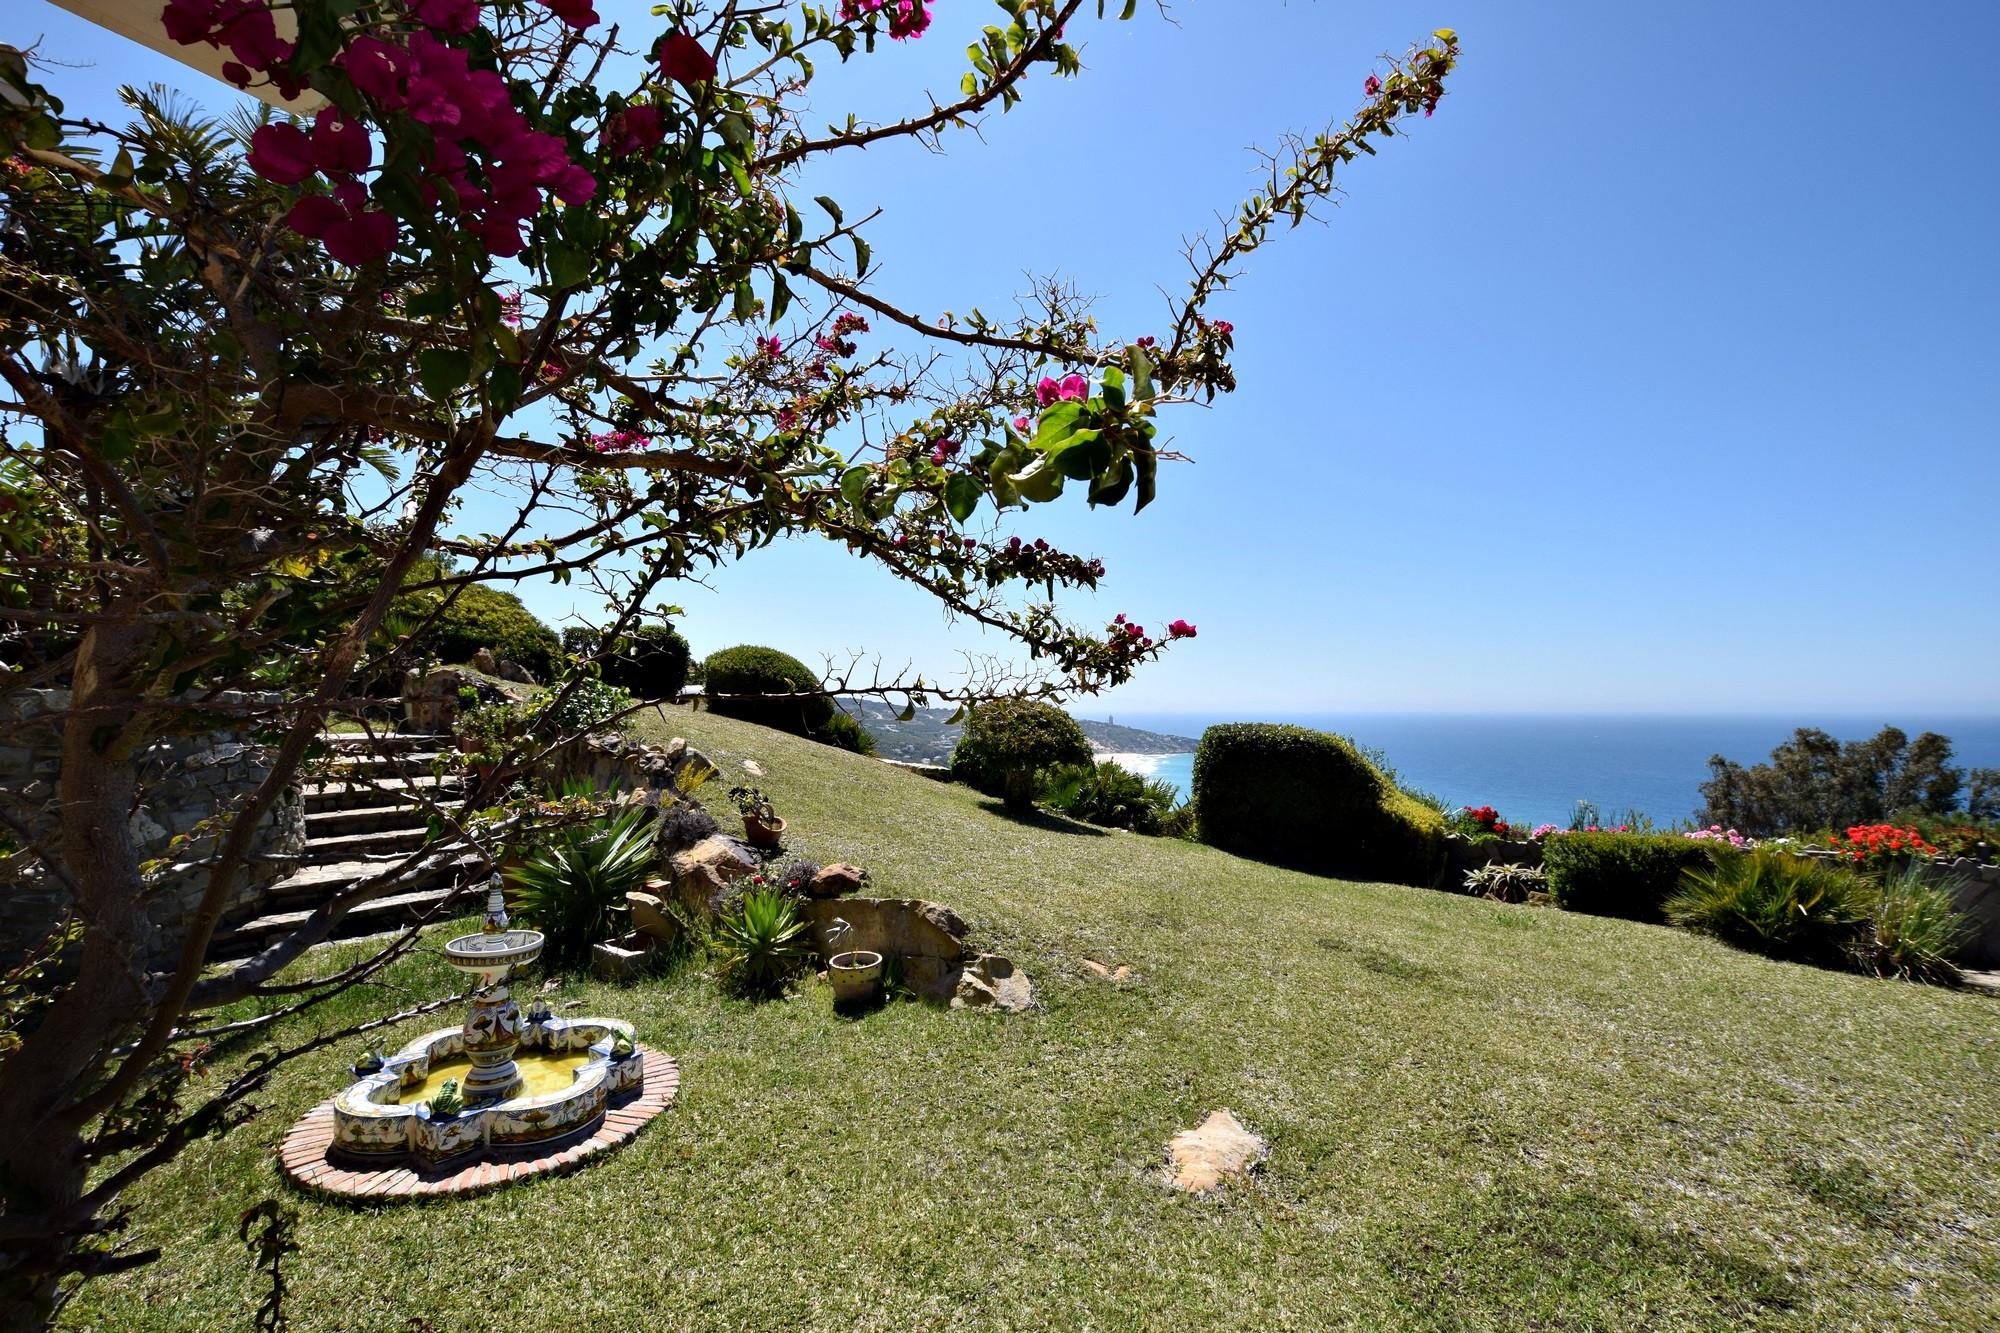 Casa Anselmo - Vistas Faro Camarinal desde Jardin